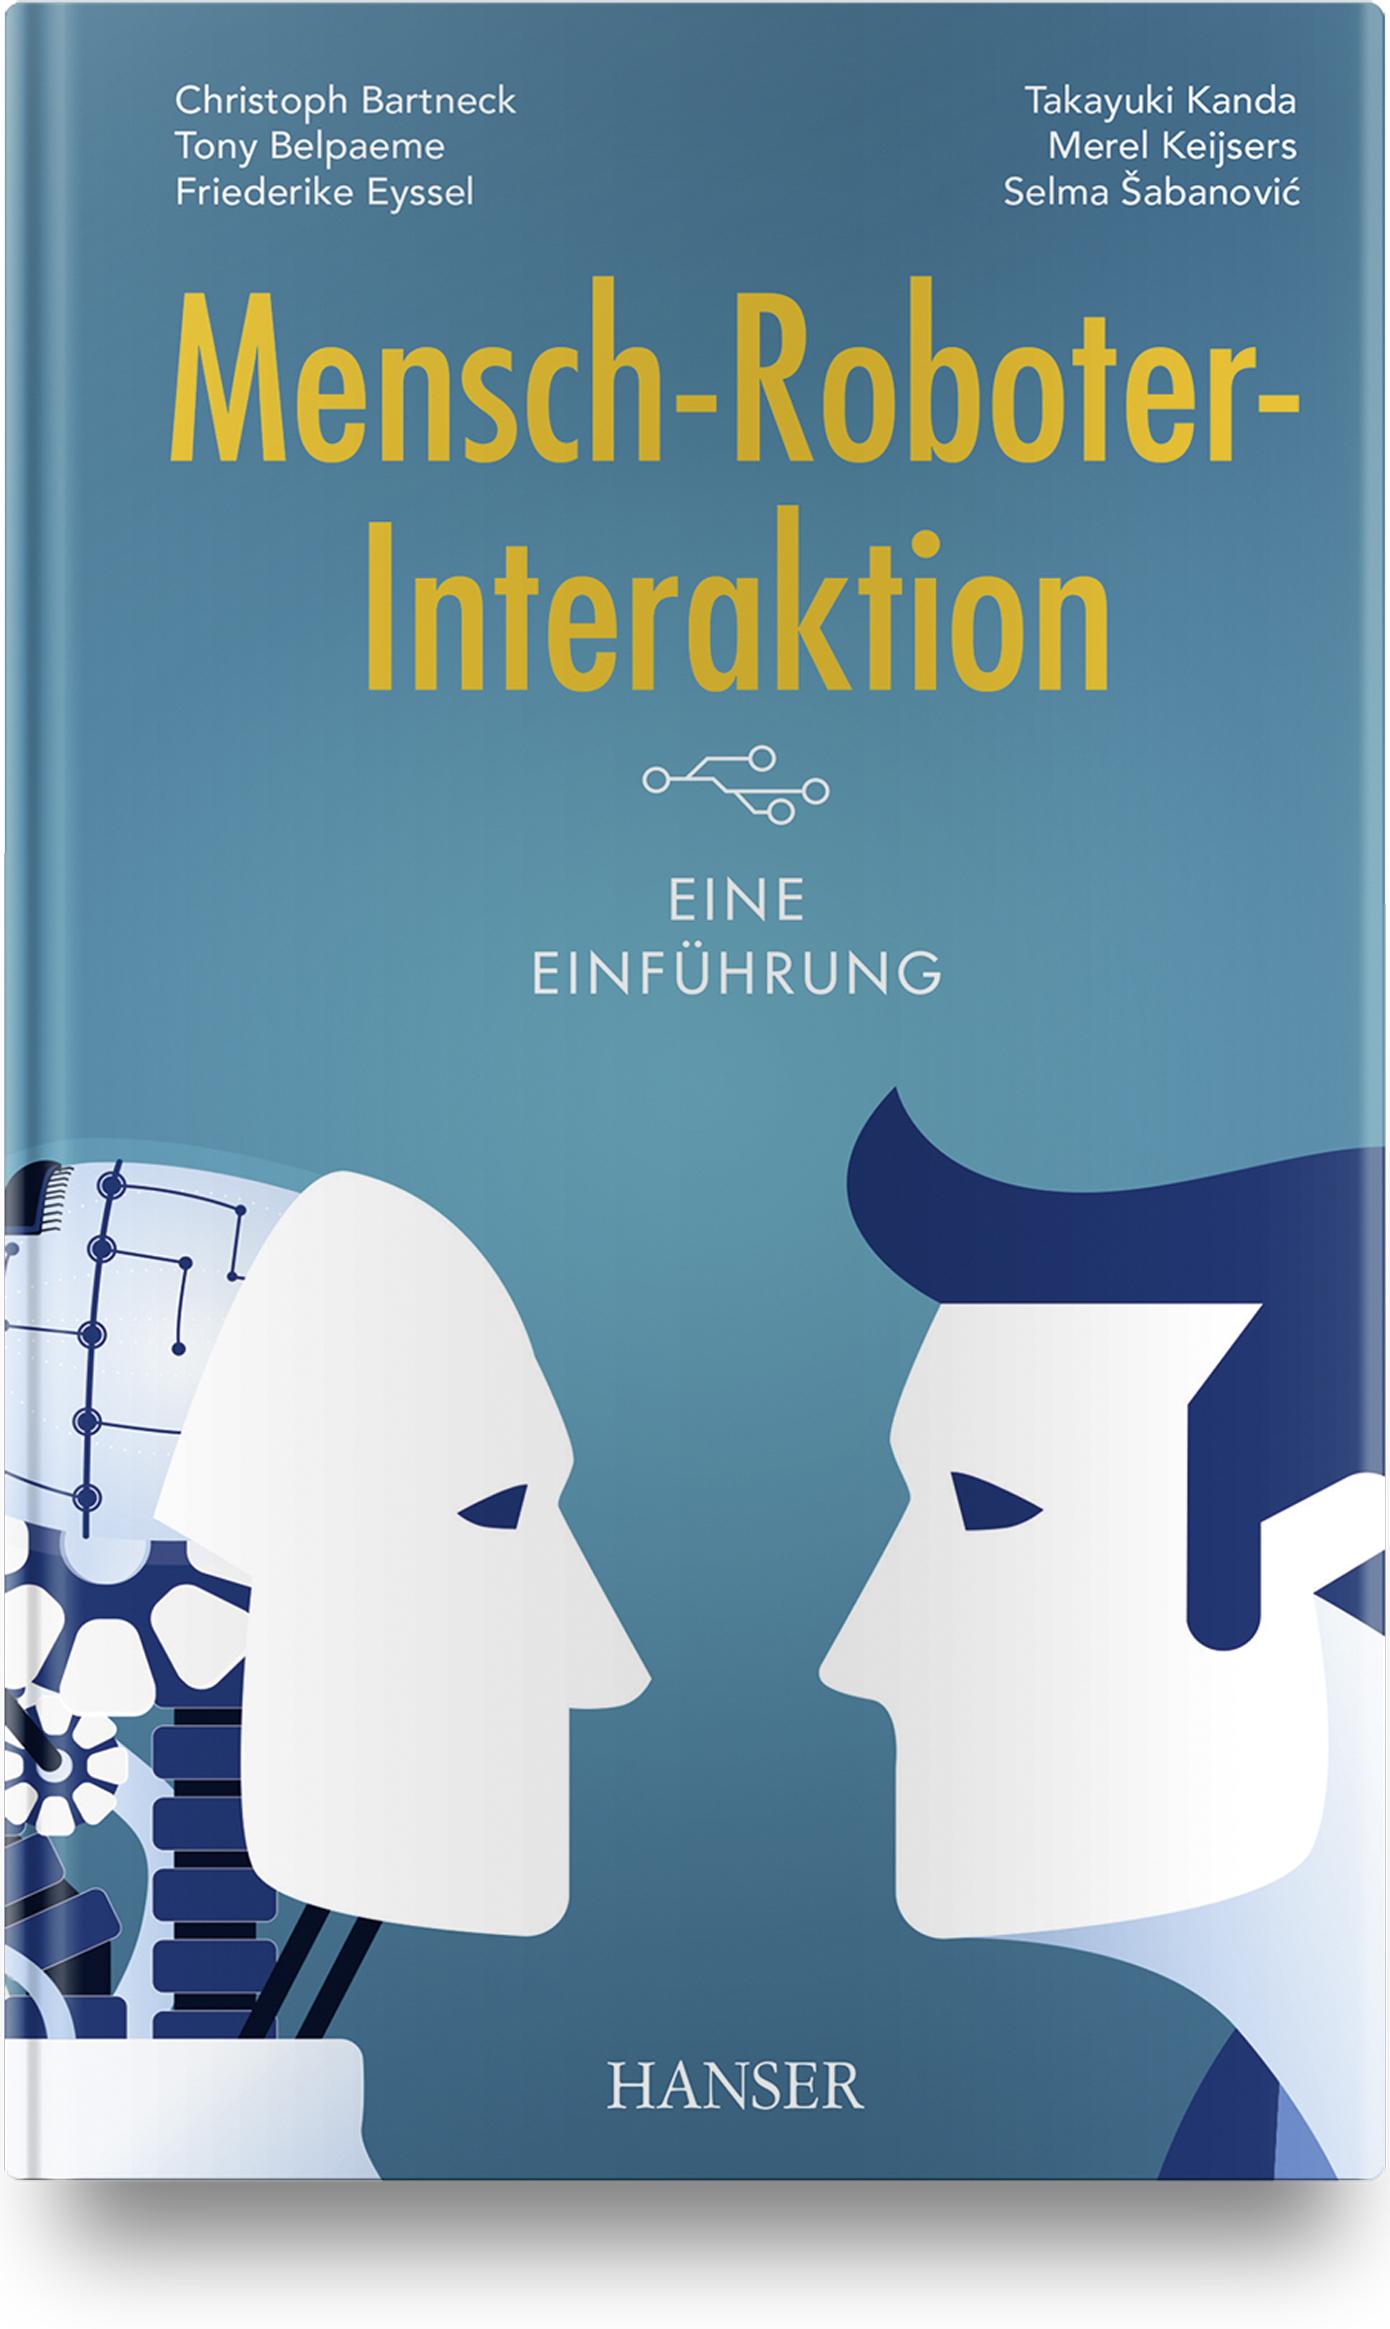 Bartneck, Belpaeme, Eyssel, Kanda, Keijsers, Šabanovi?, Mensch-Roboter-Interaktion, 978-3-446-46412-4